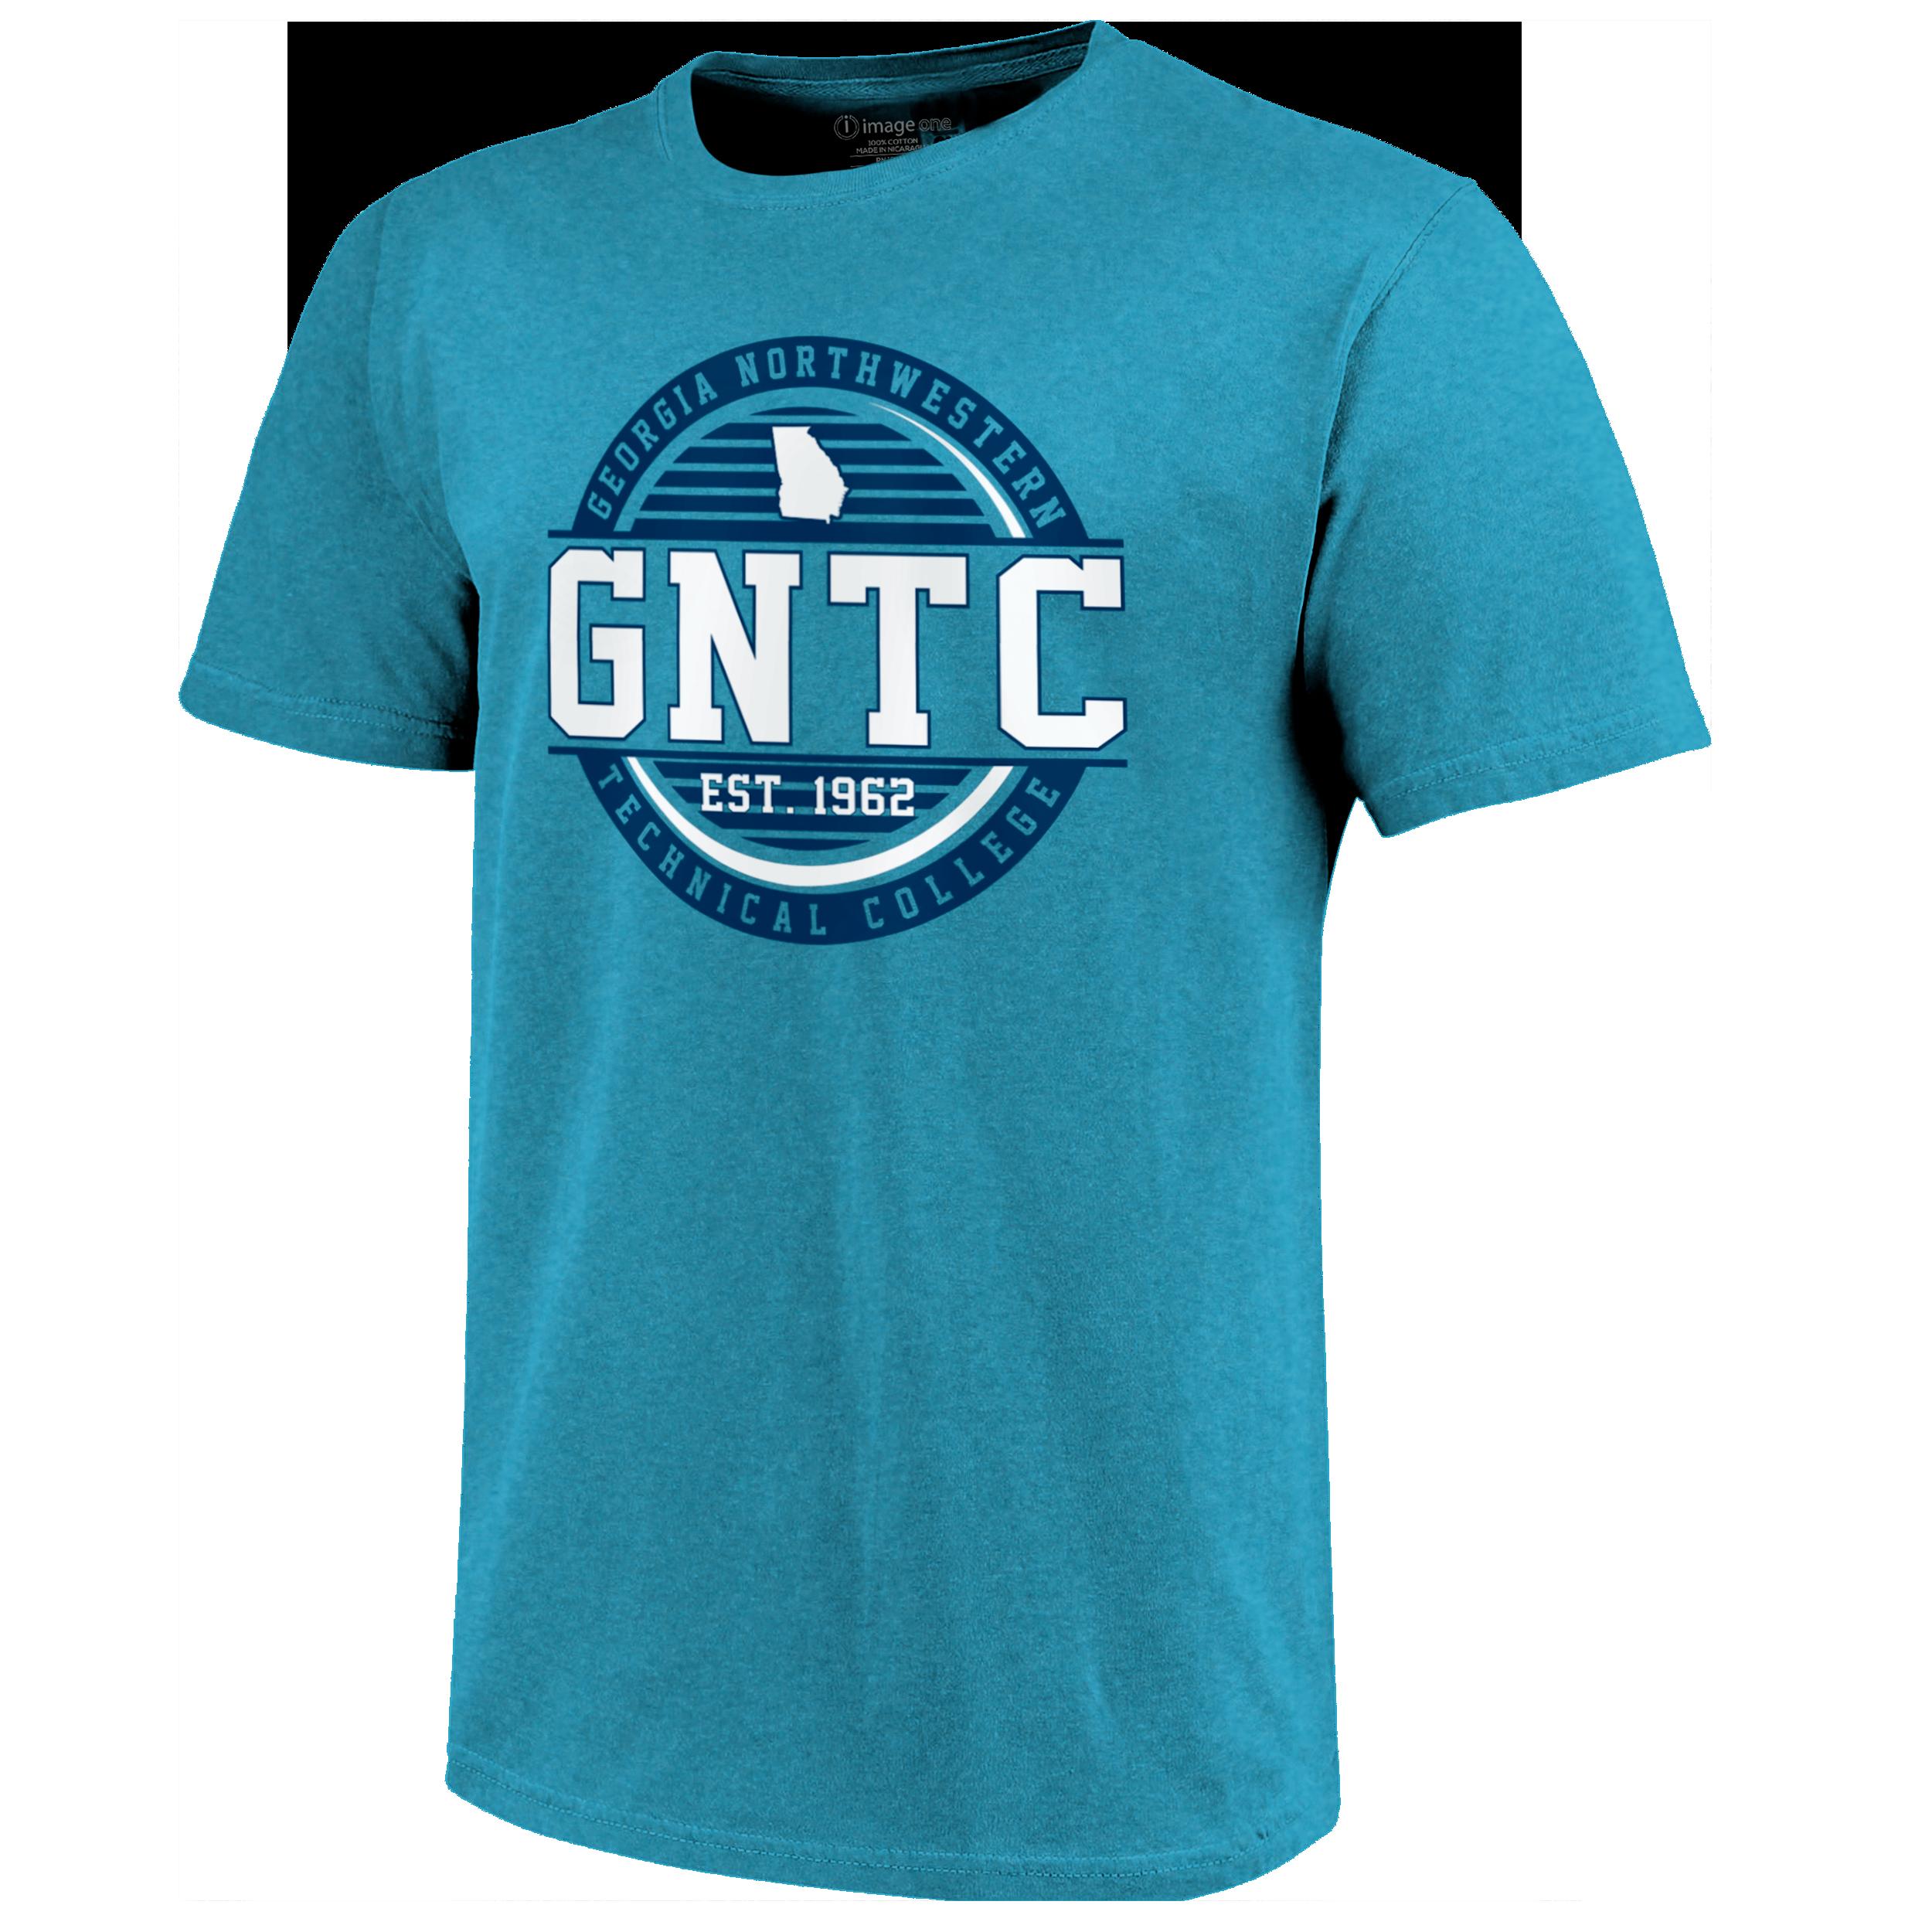 GNTC Est. 1962 Basic Tshirt